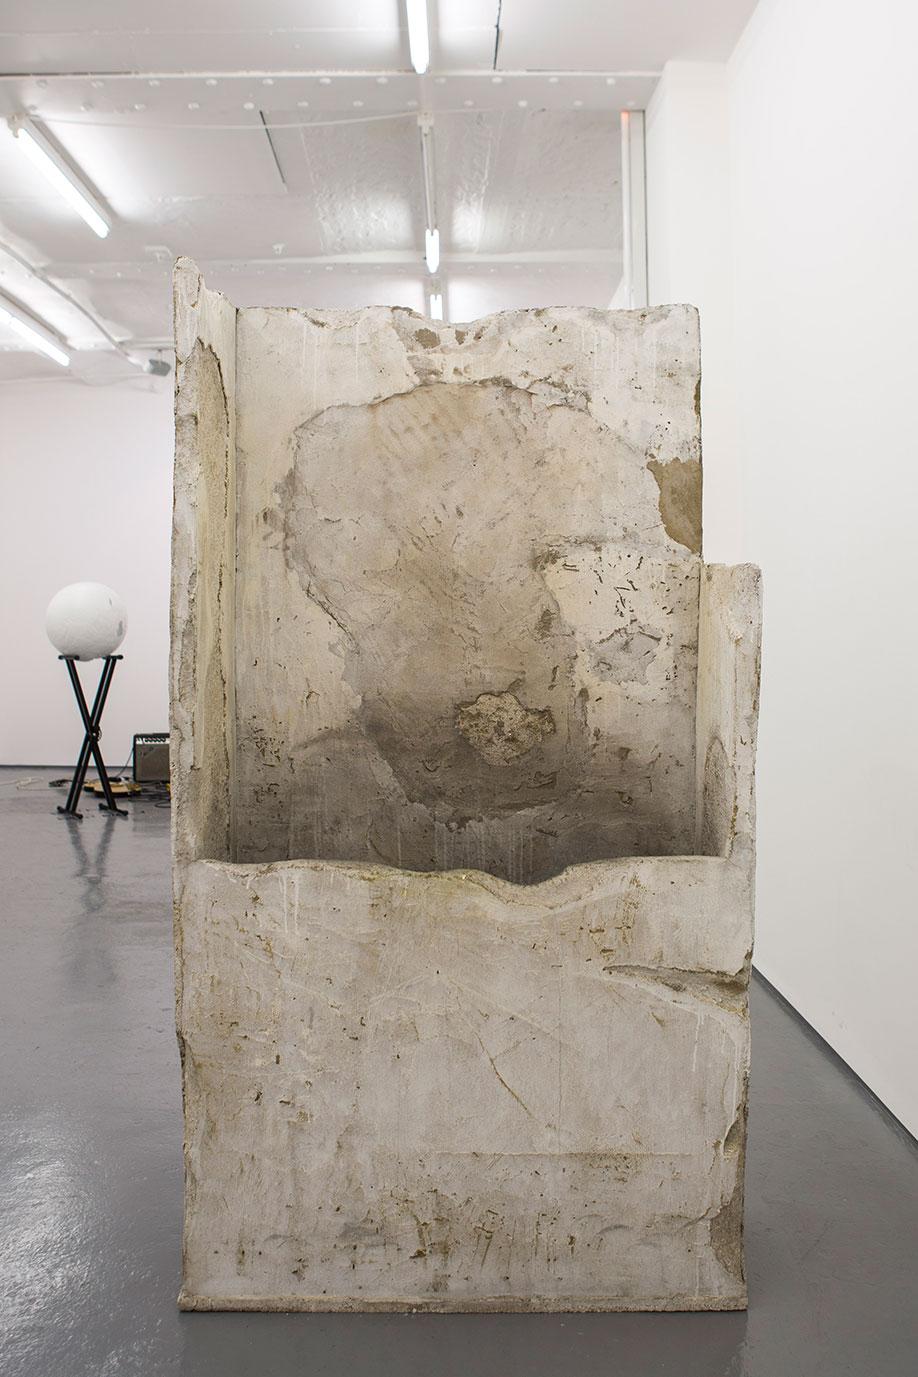 <b>Title:</b>Concrete Container, by Ana Genovés<br /><b>Year:</b>2015<br /><b>Medium:</b>Polystyrene and cement<br /><b>Size:</b>92 x 170 x 37 cm